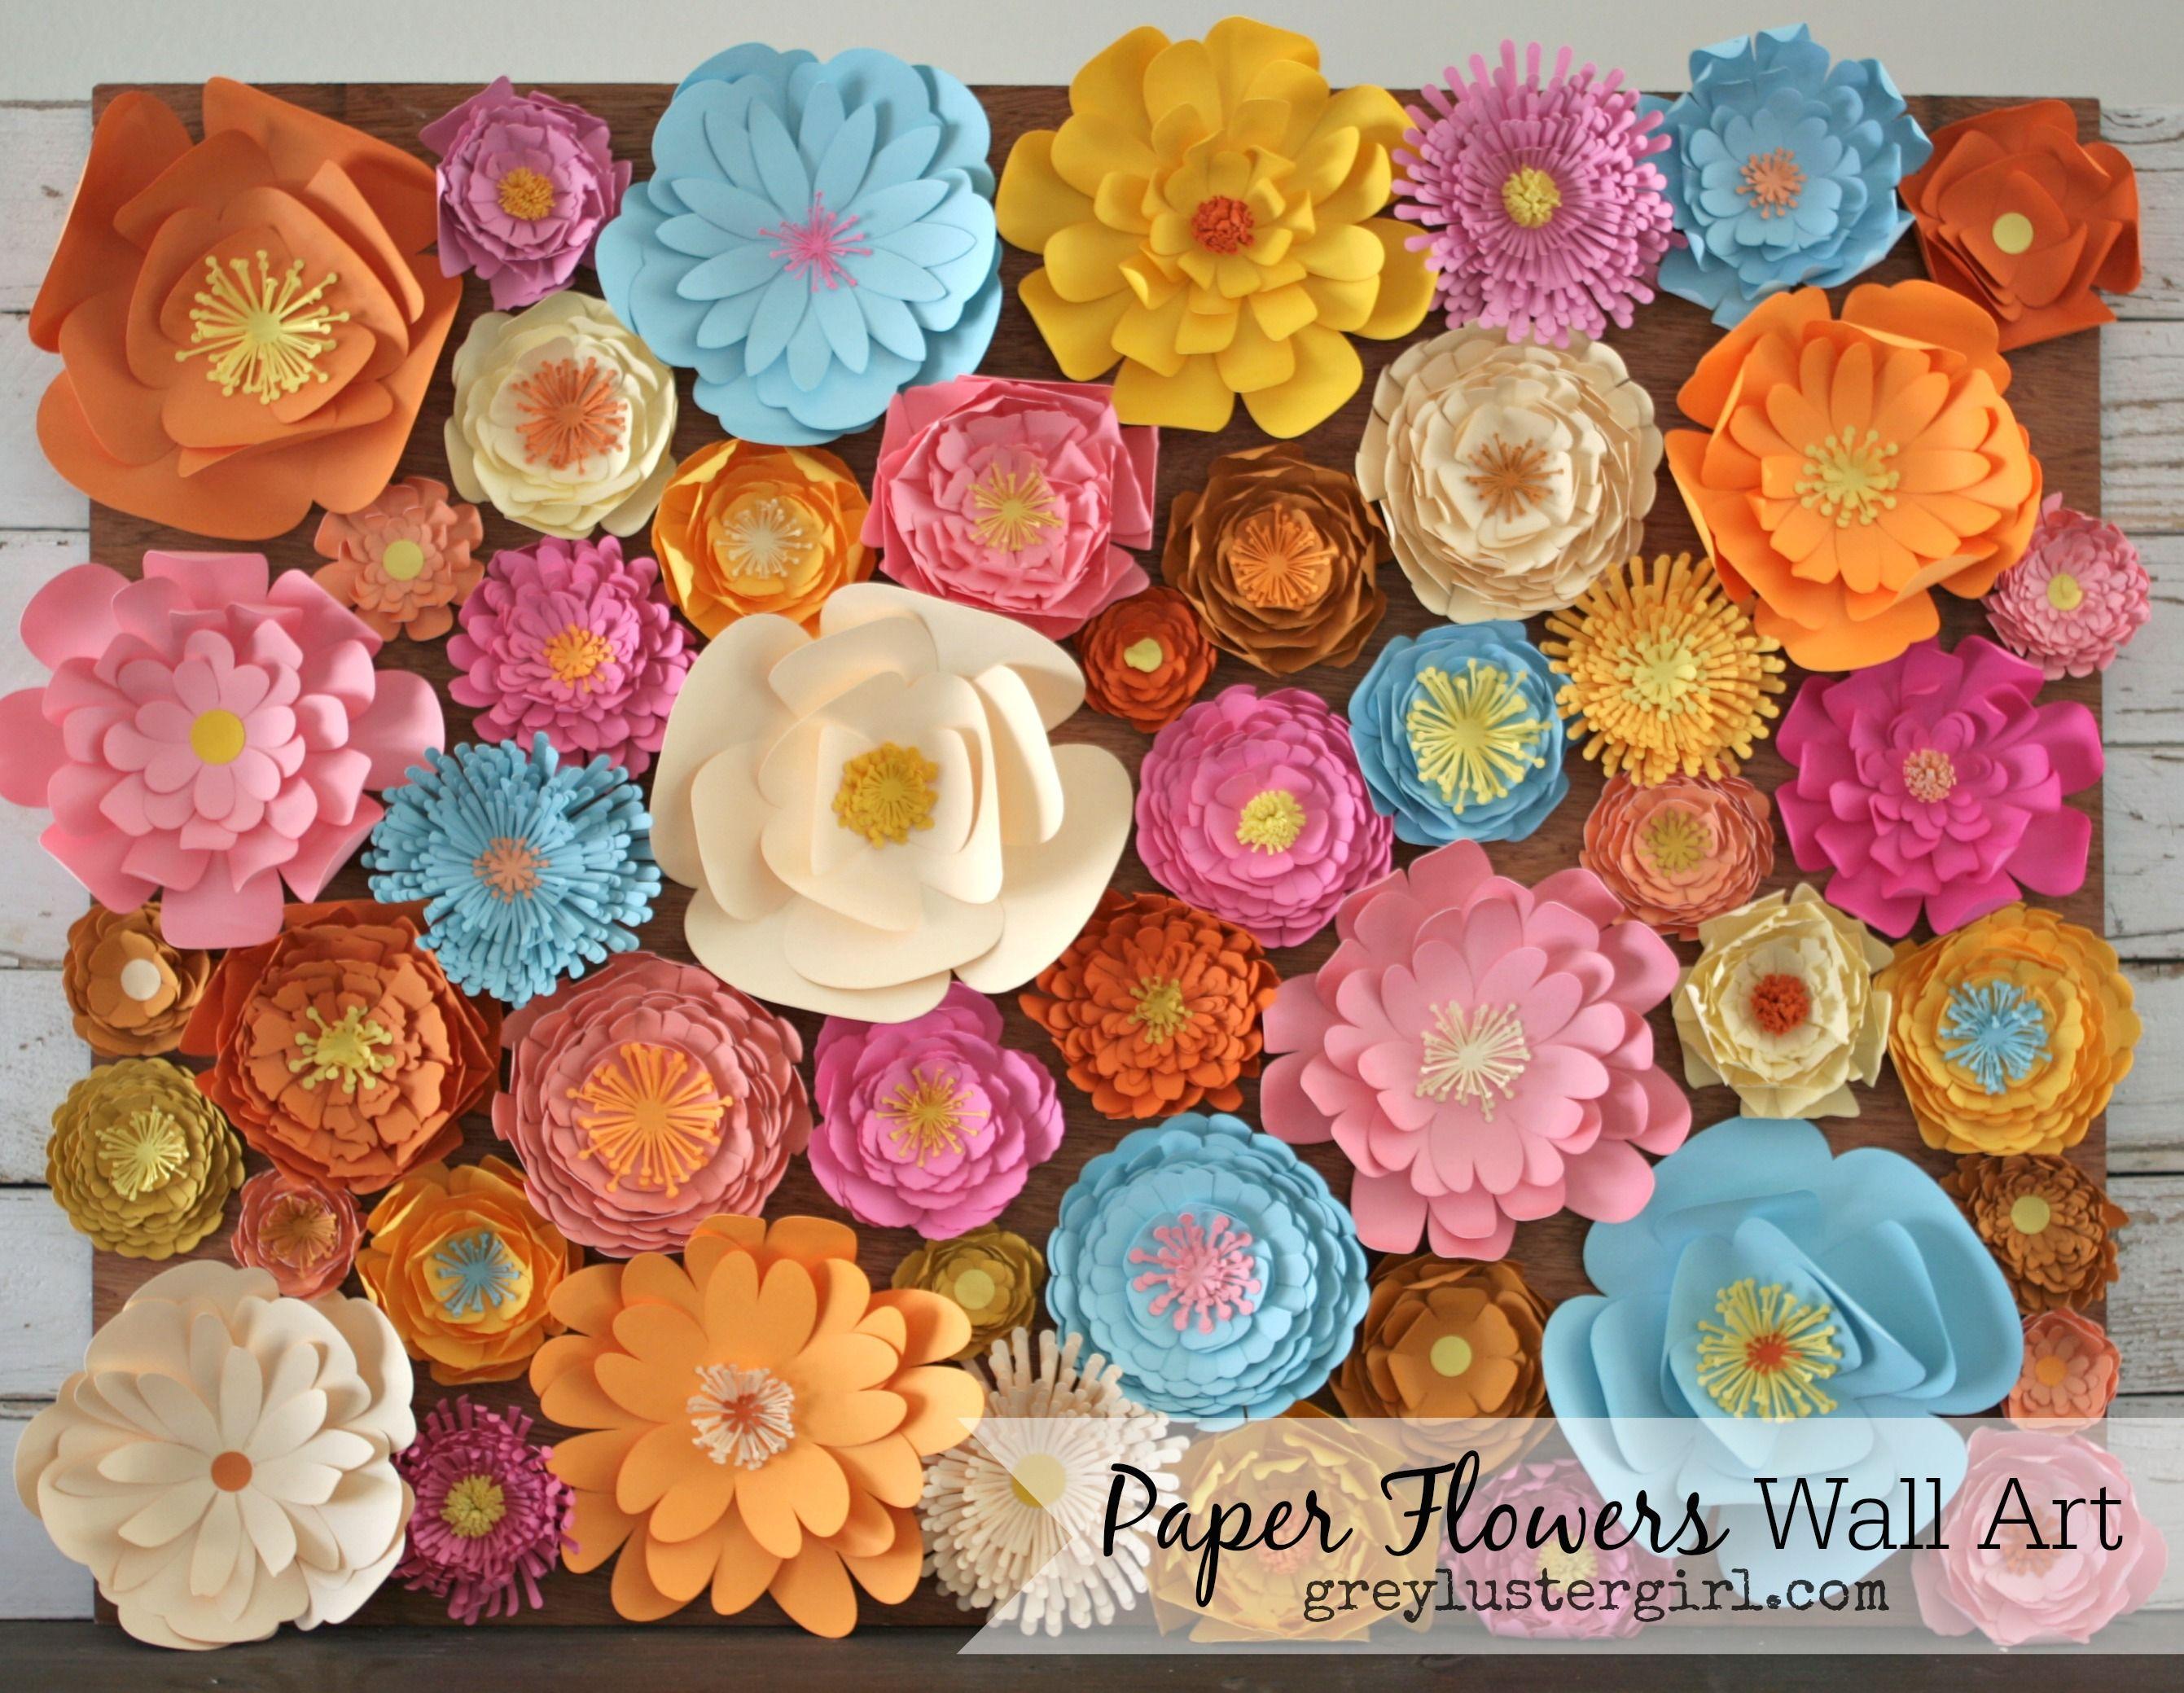 76 Diy Wall Art Ideas For Those Blank Walls Paper Flowers Diy